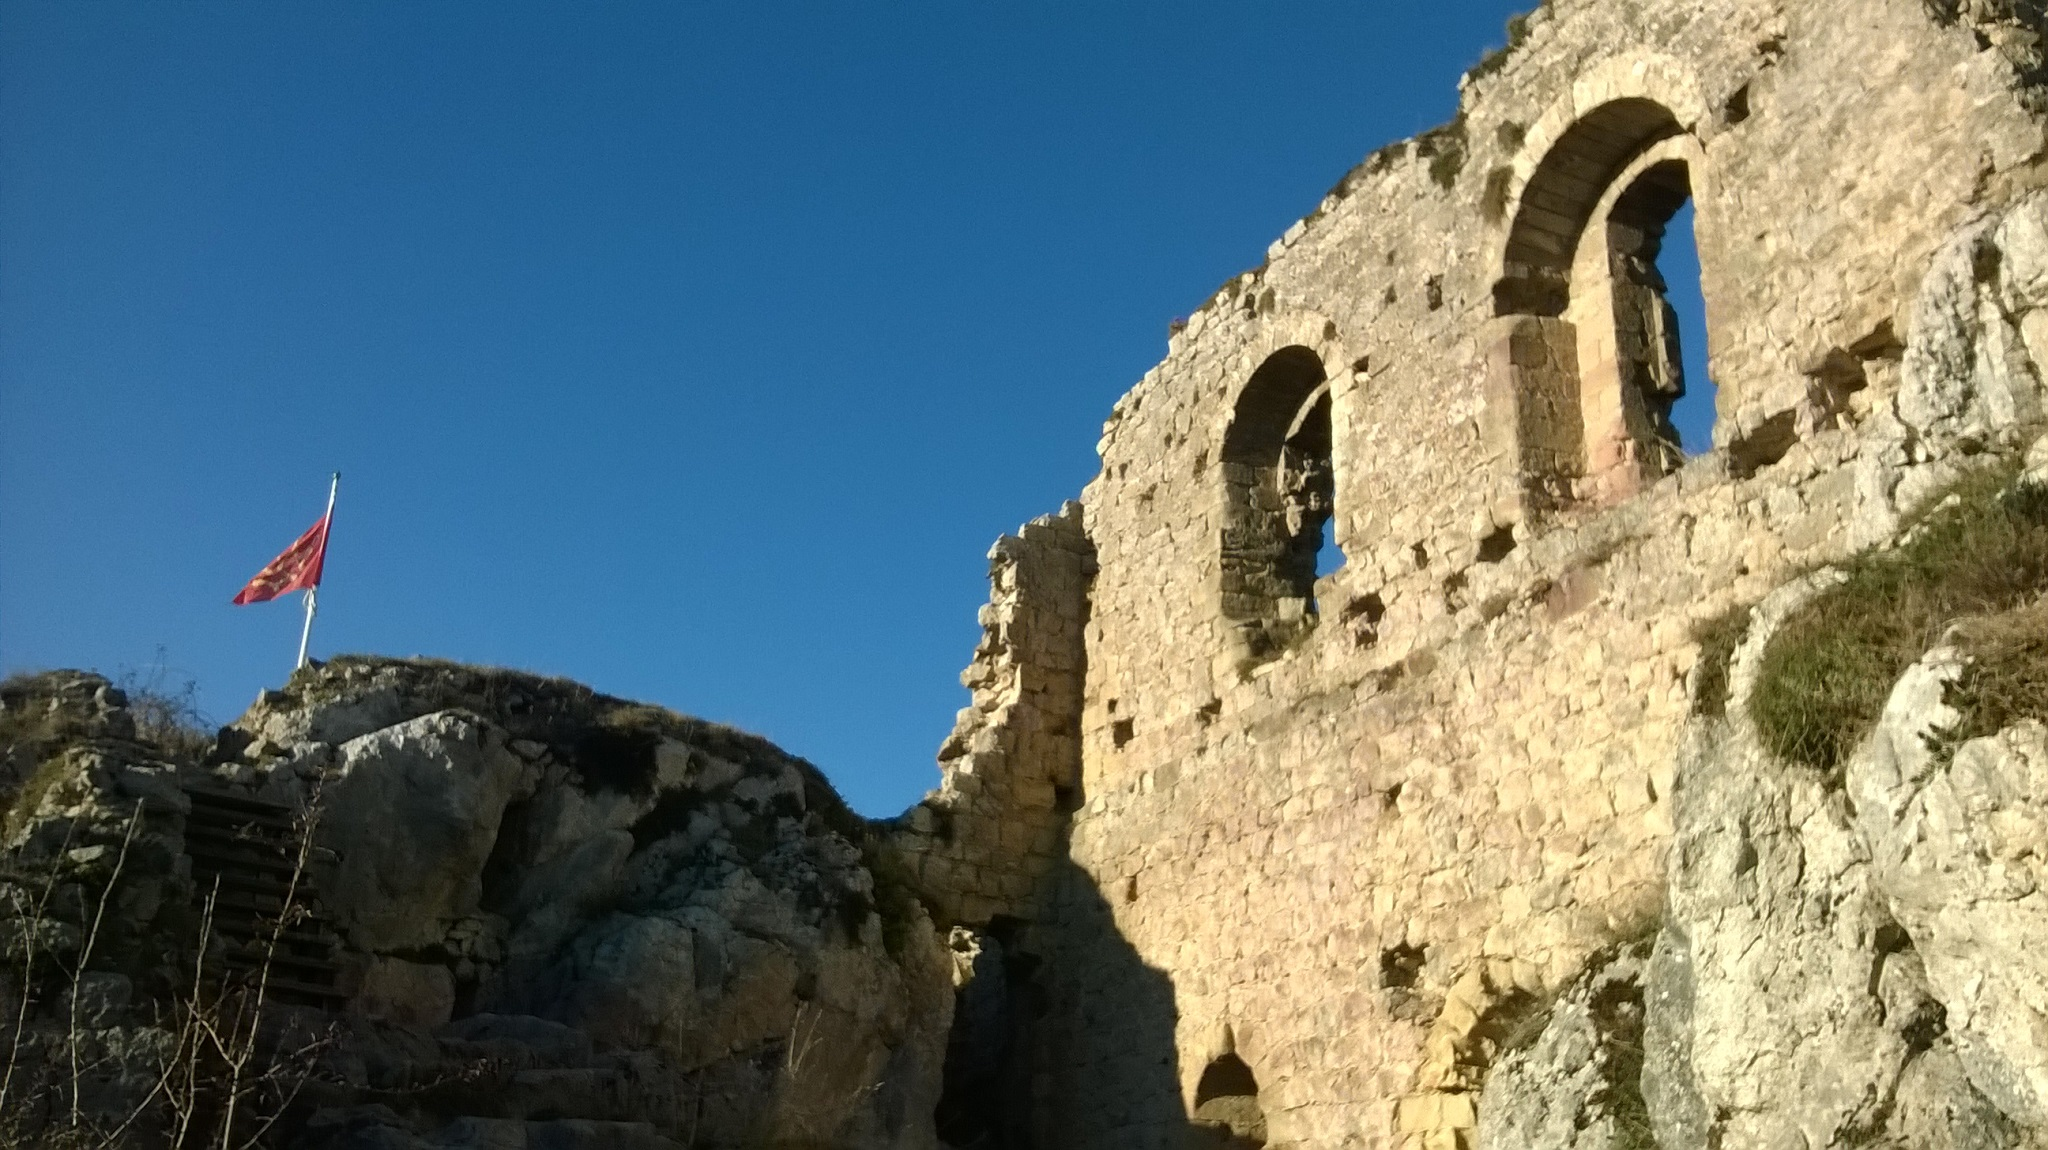 Château de Roquefixade (ruins), on the left waves the flag of Occitania